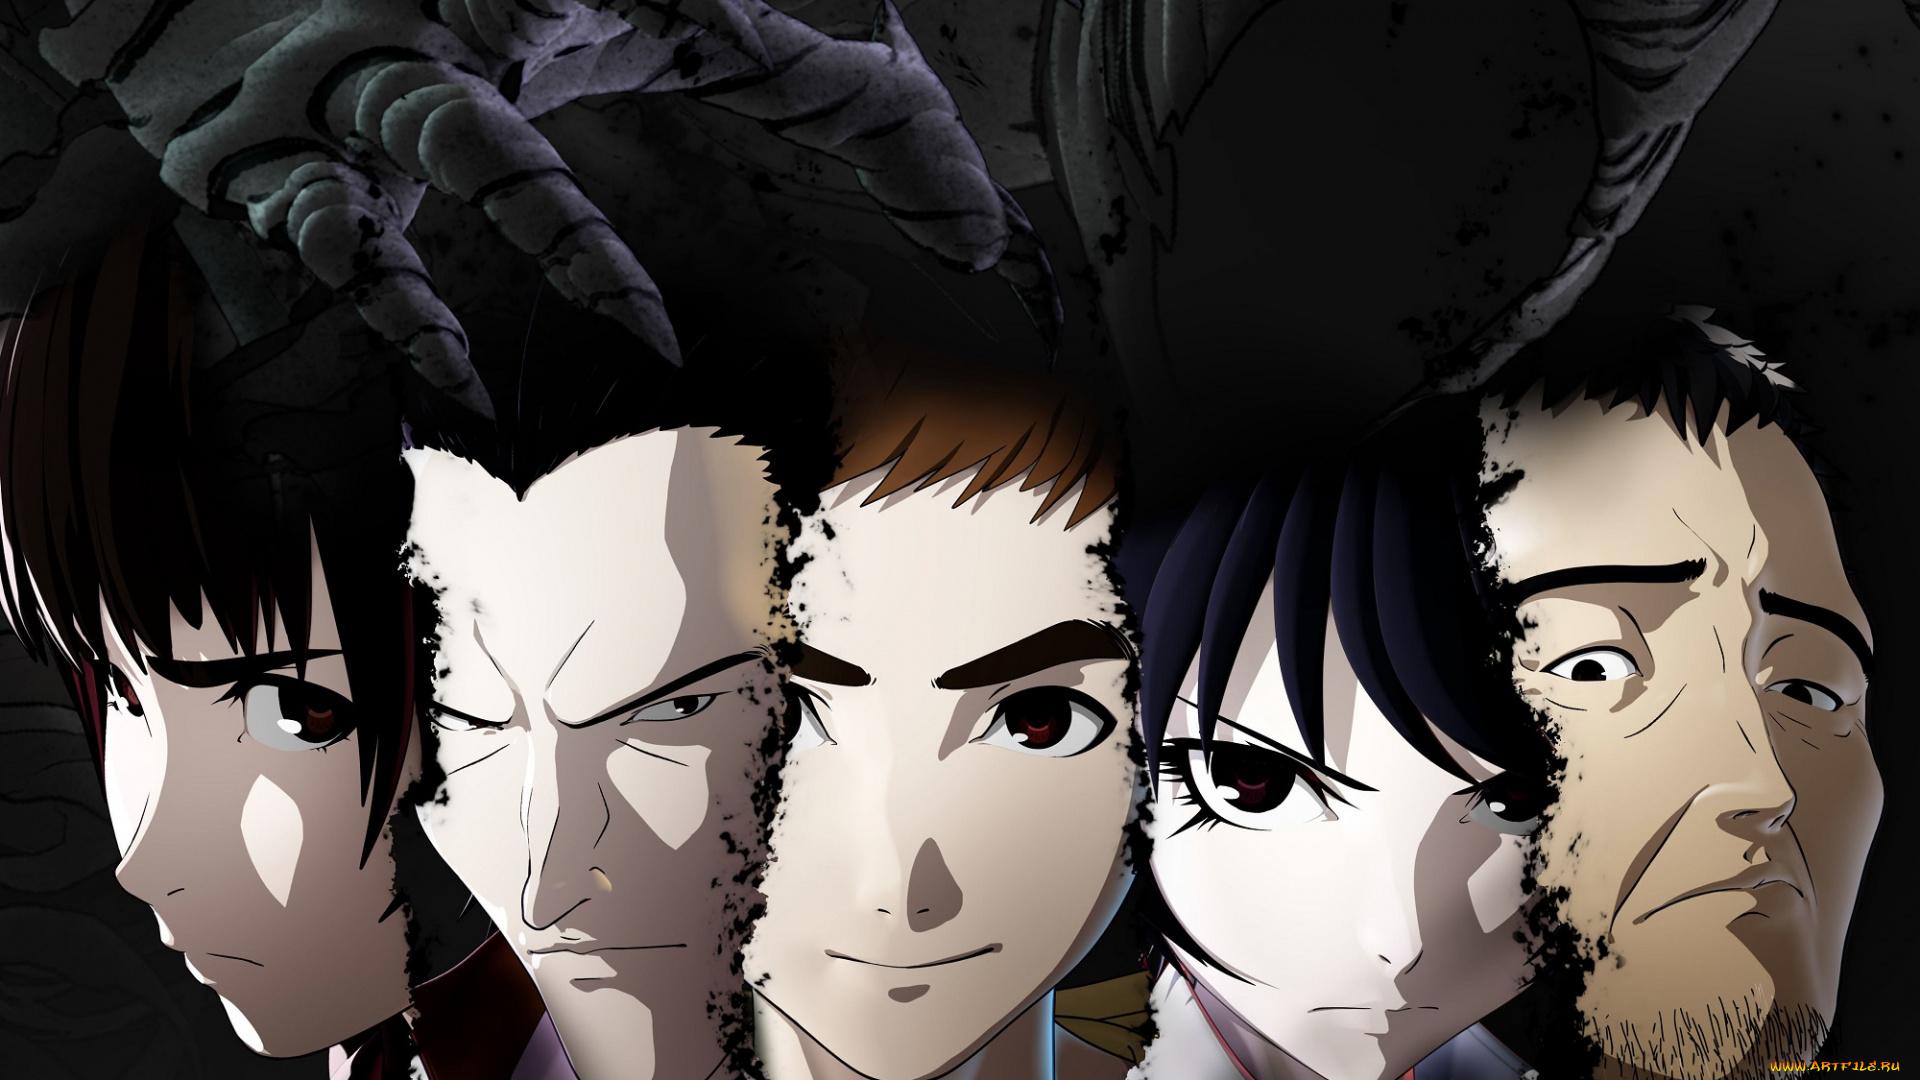 demi humans anime - HD1920×1080